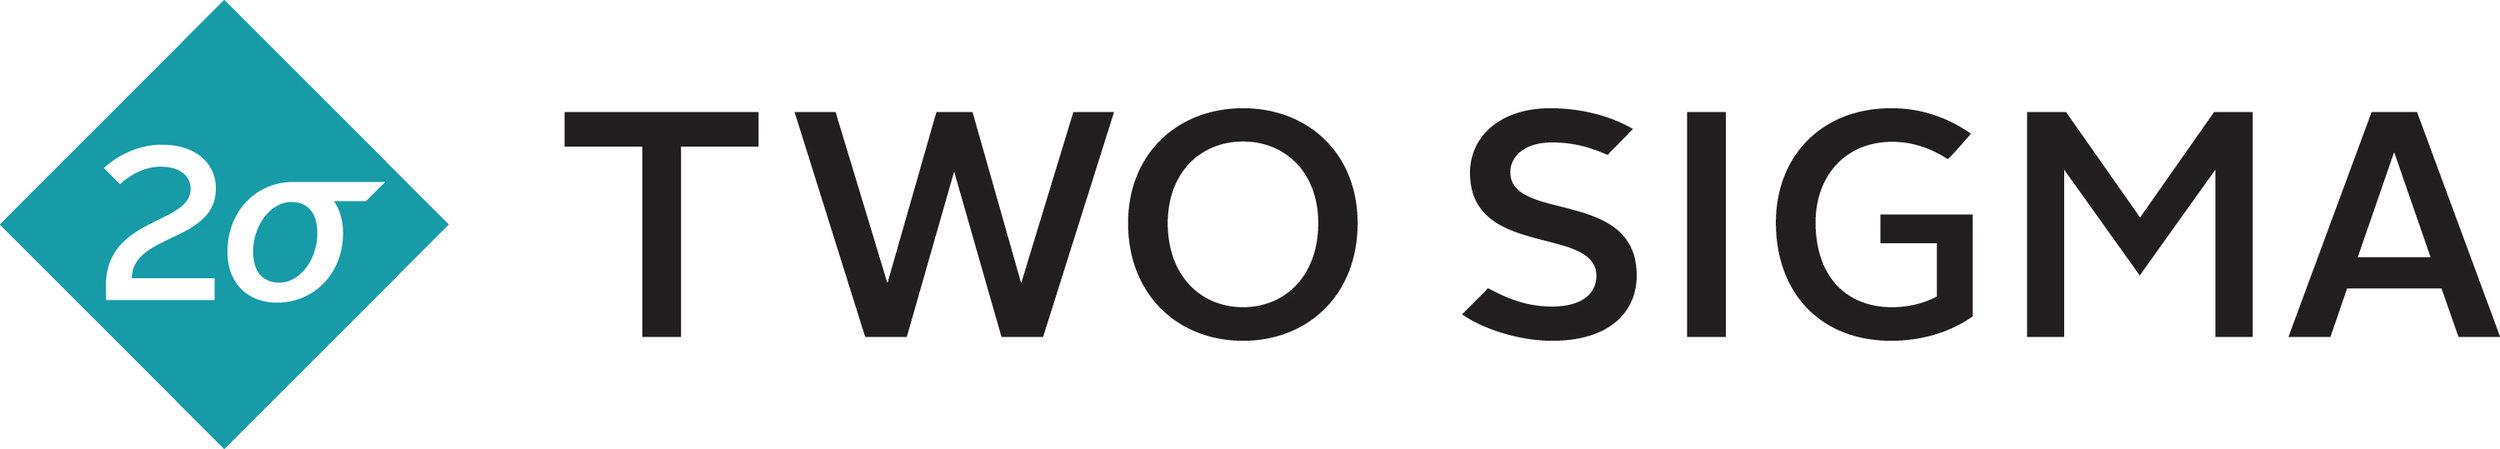 TwoSigma_Logo_RGB[1].jpg